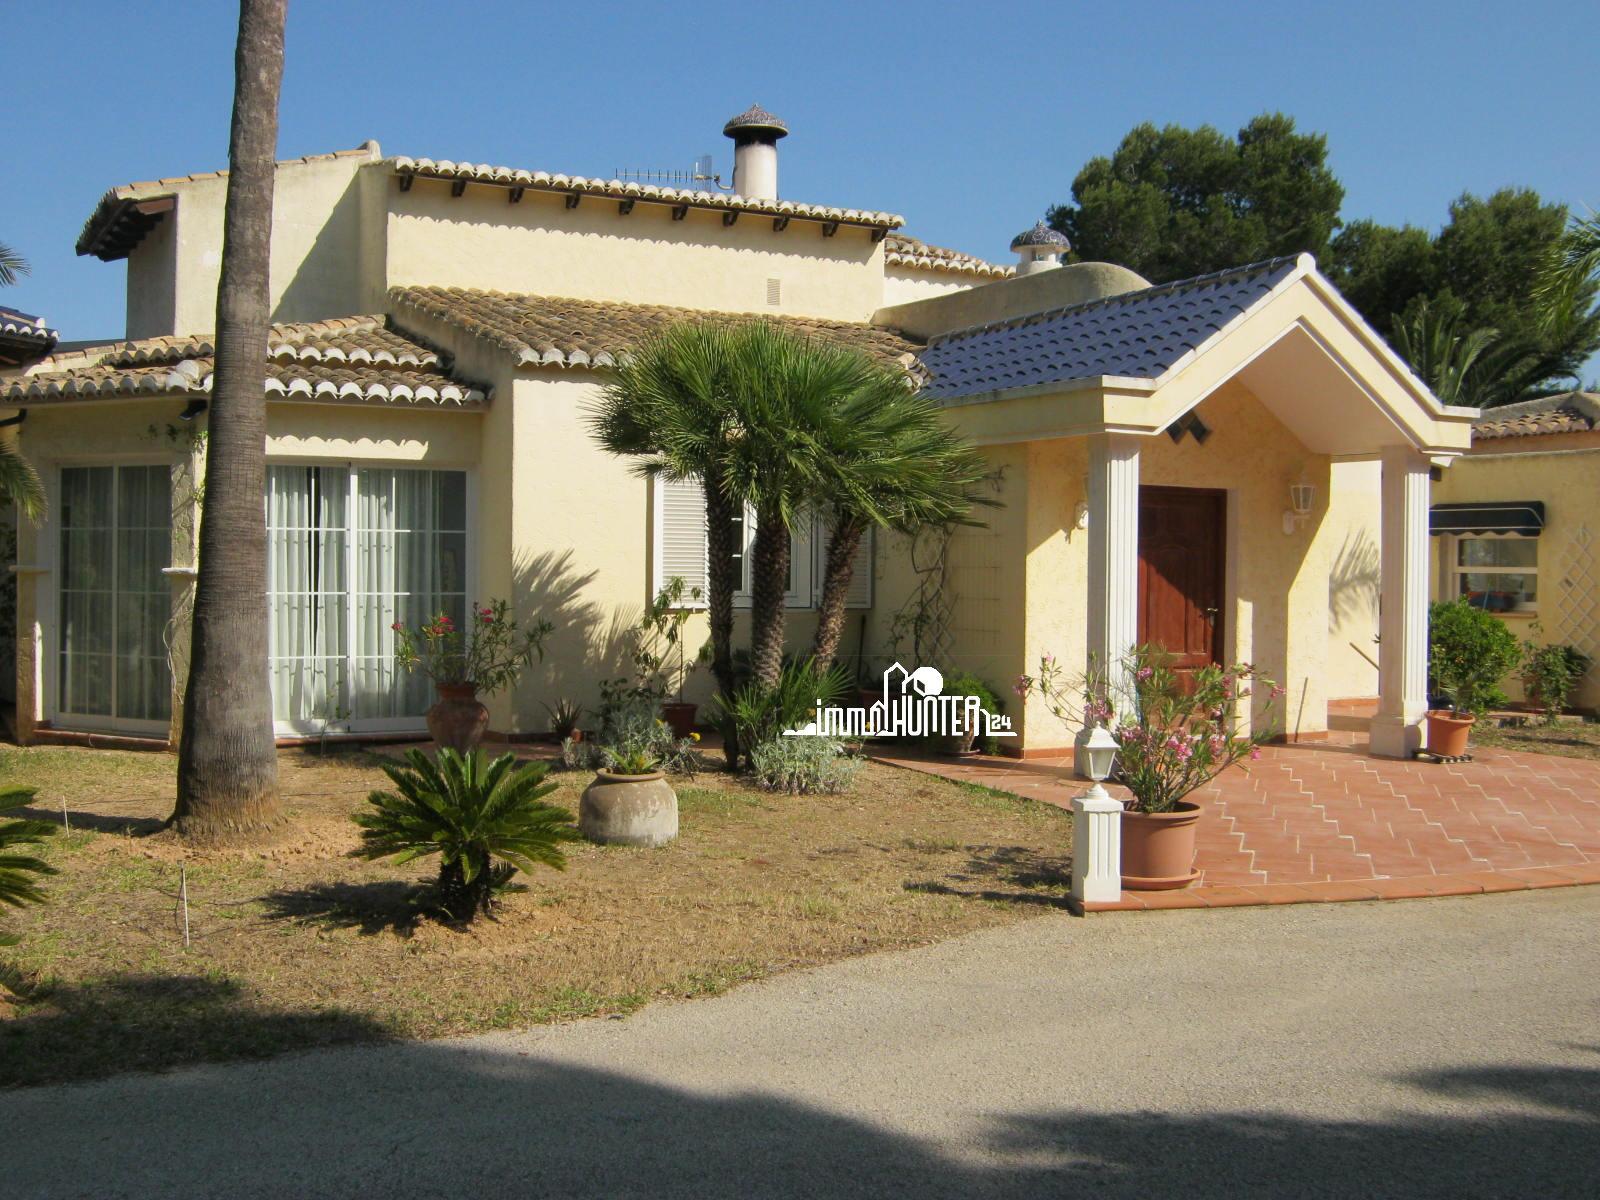 Magnifica Villa con amplio terreno en Moraira | 320 m²